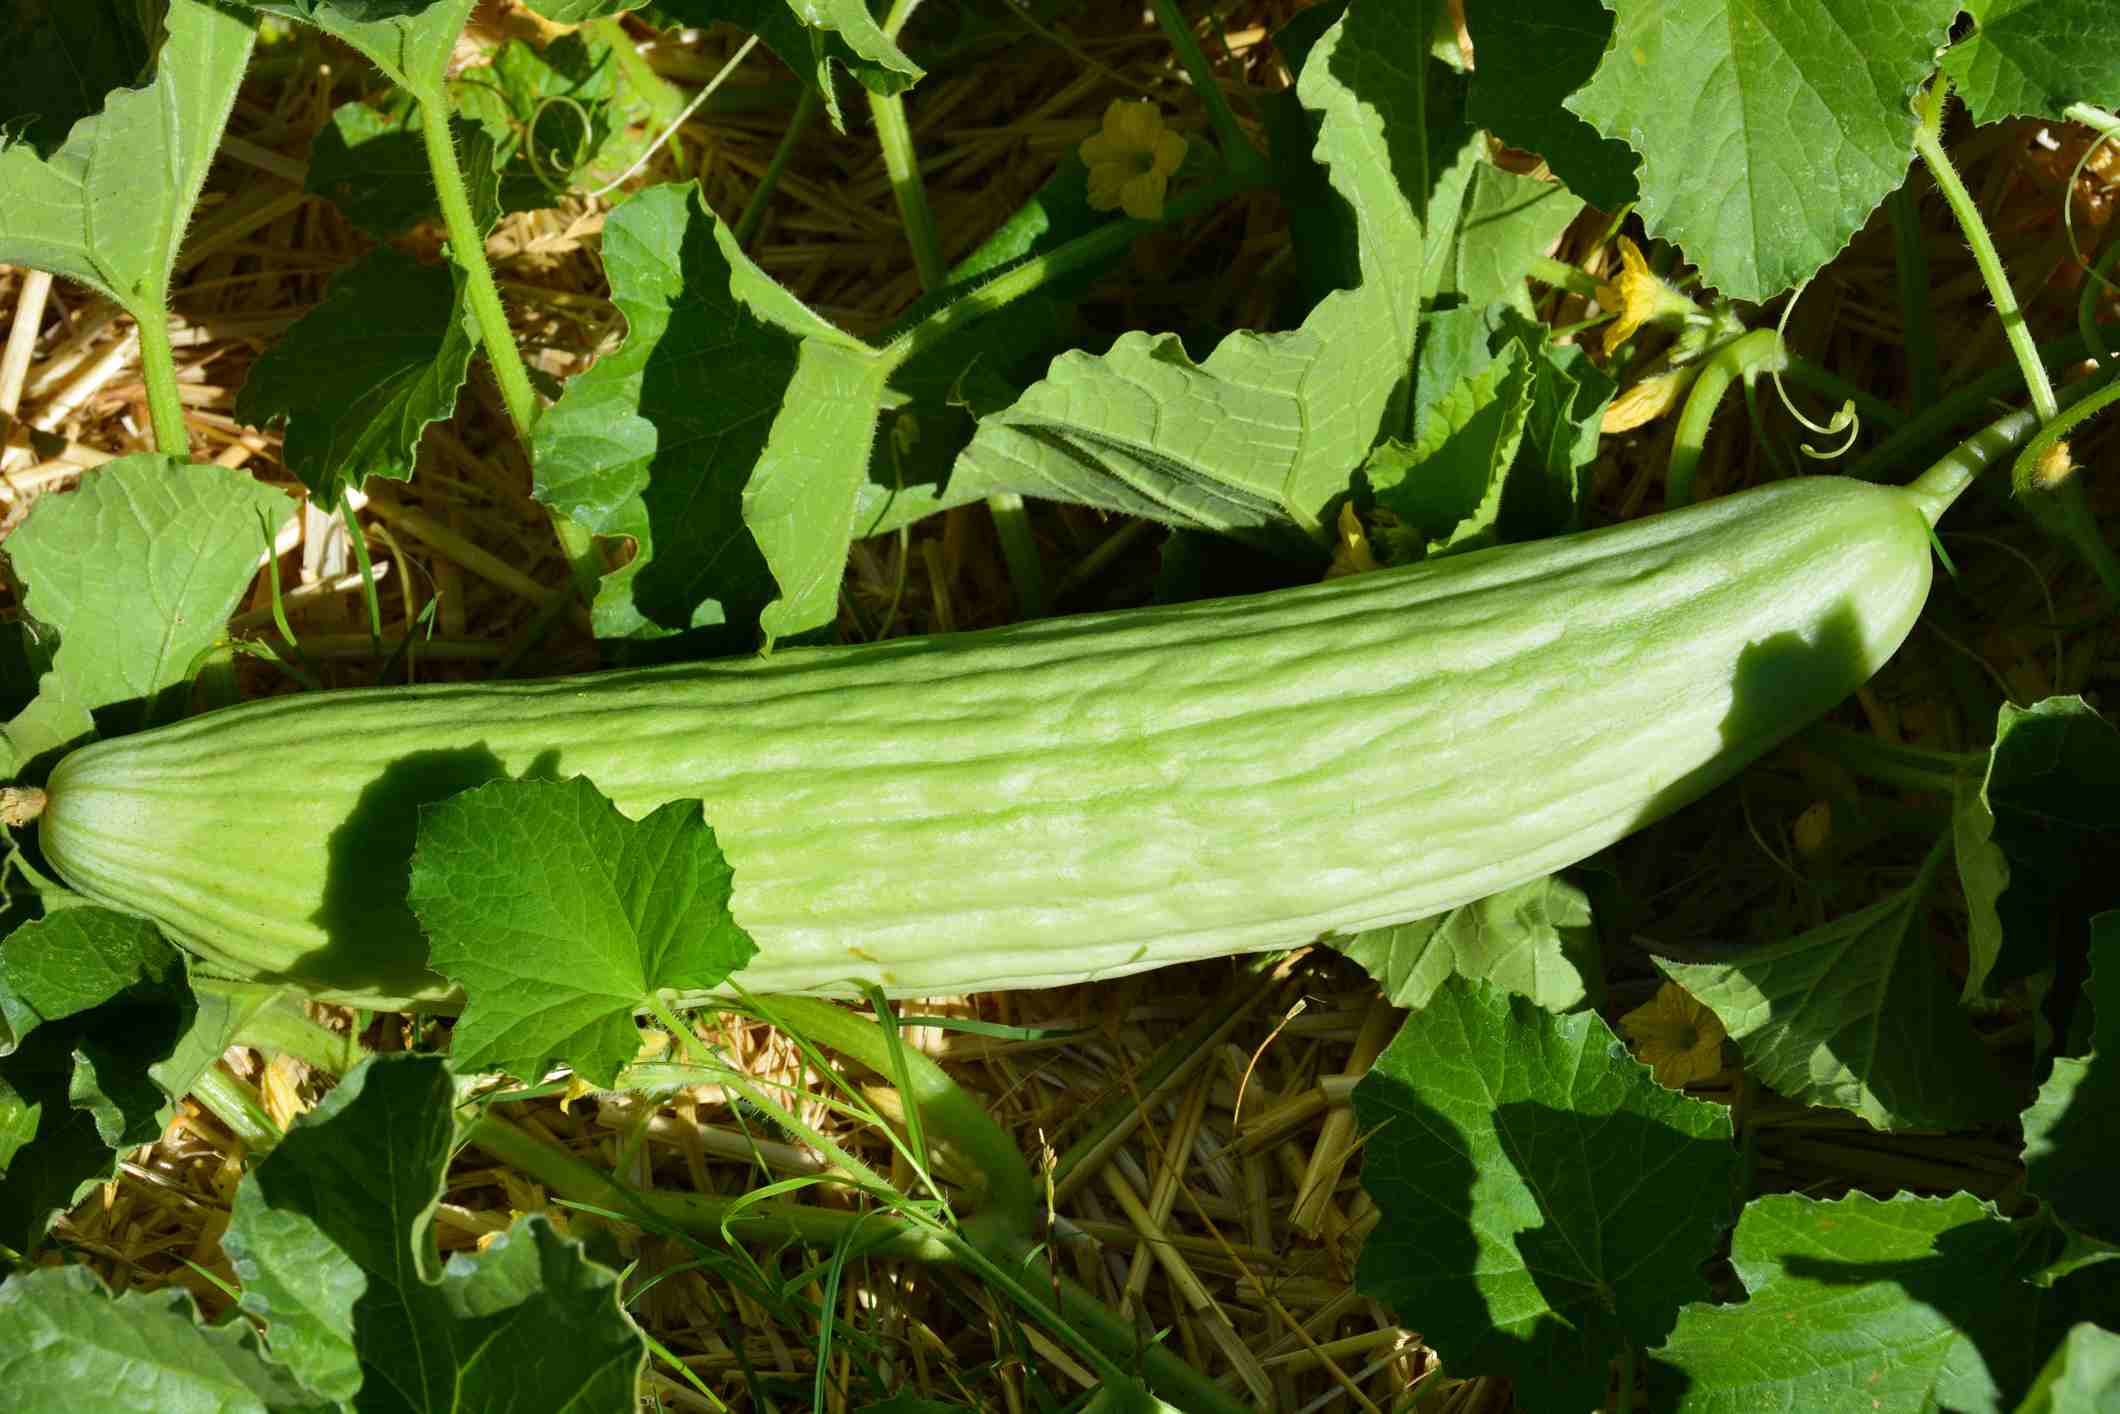 Armenian Cucumber Growing on the Vine